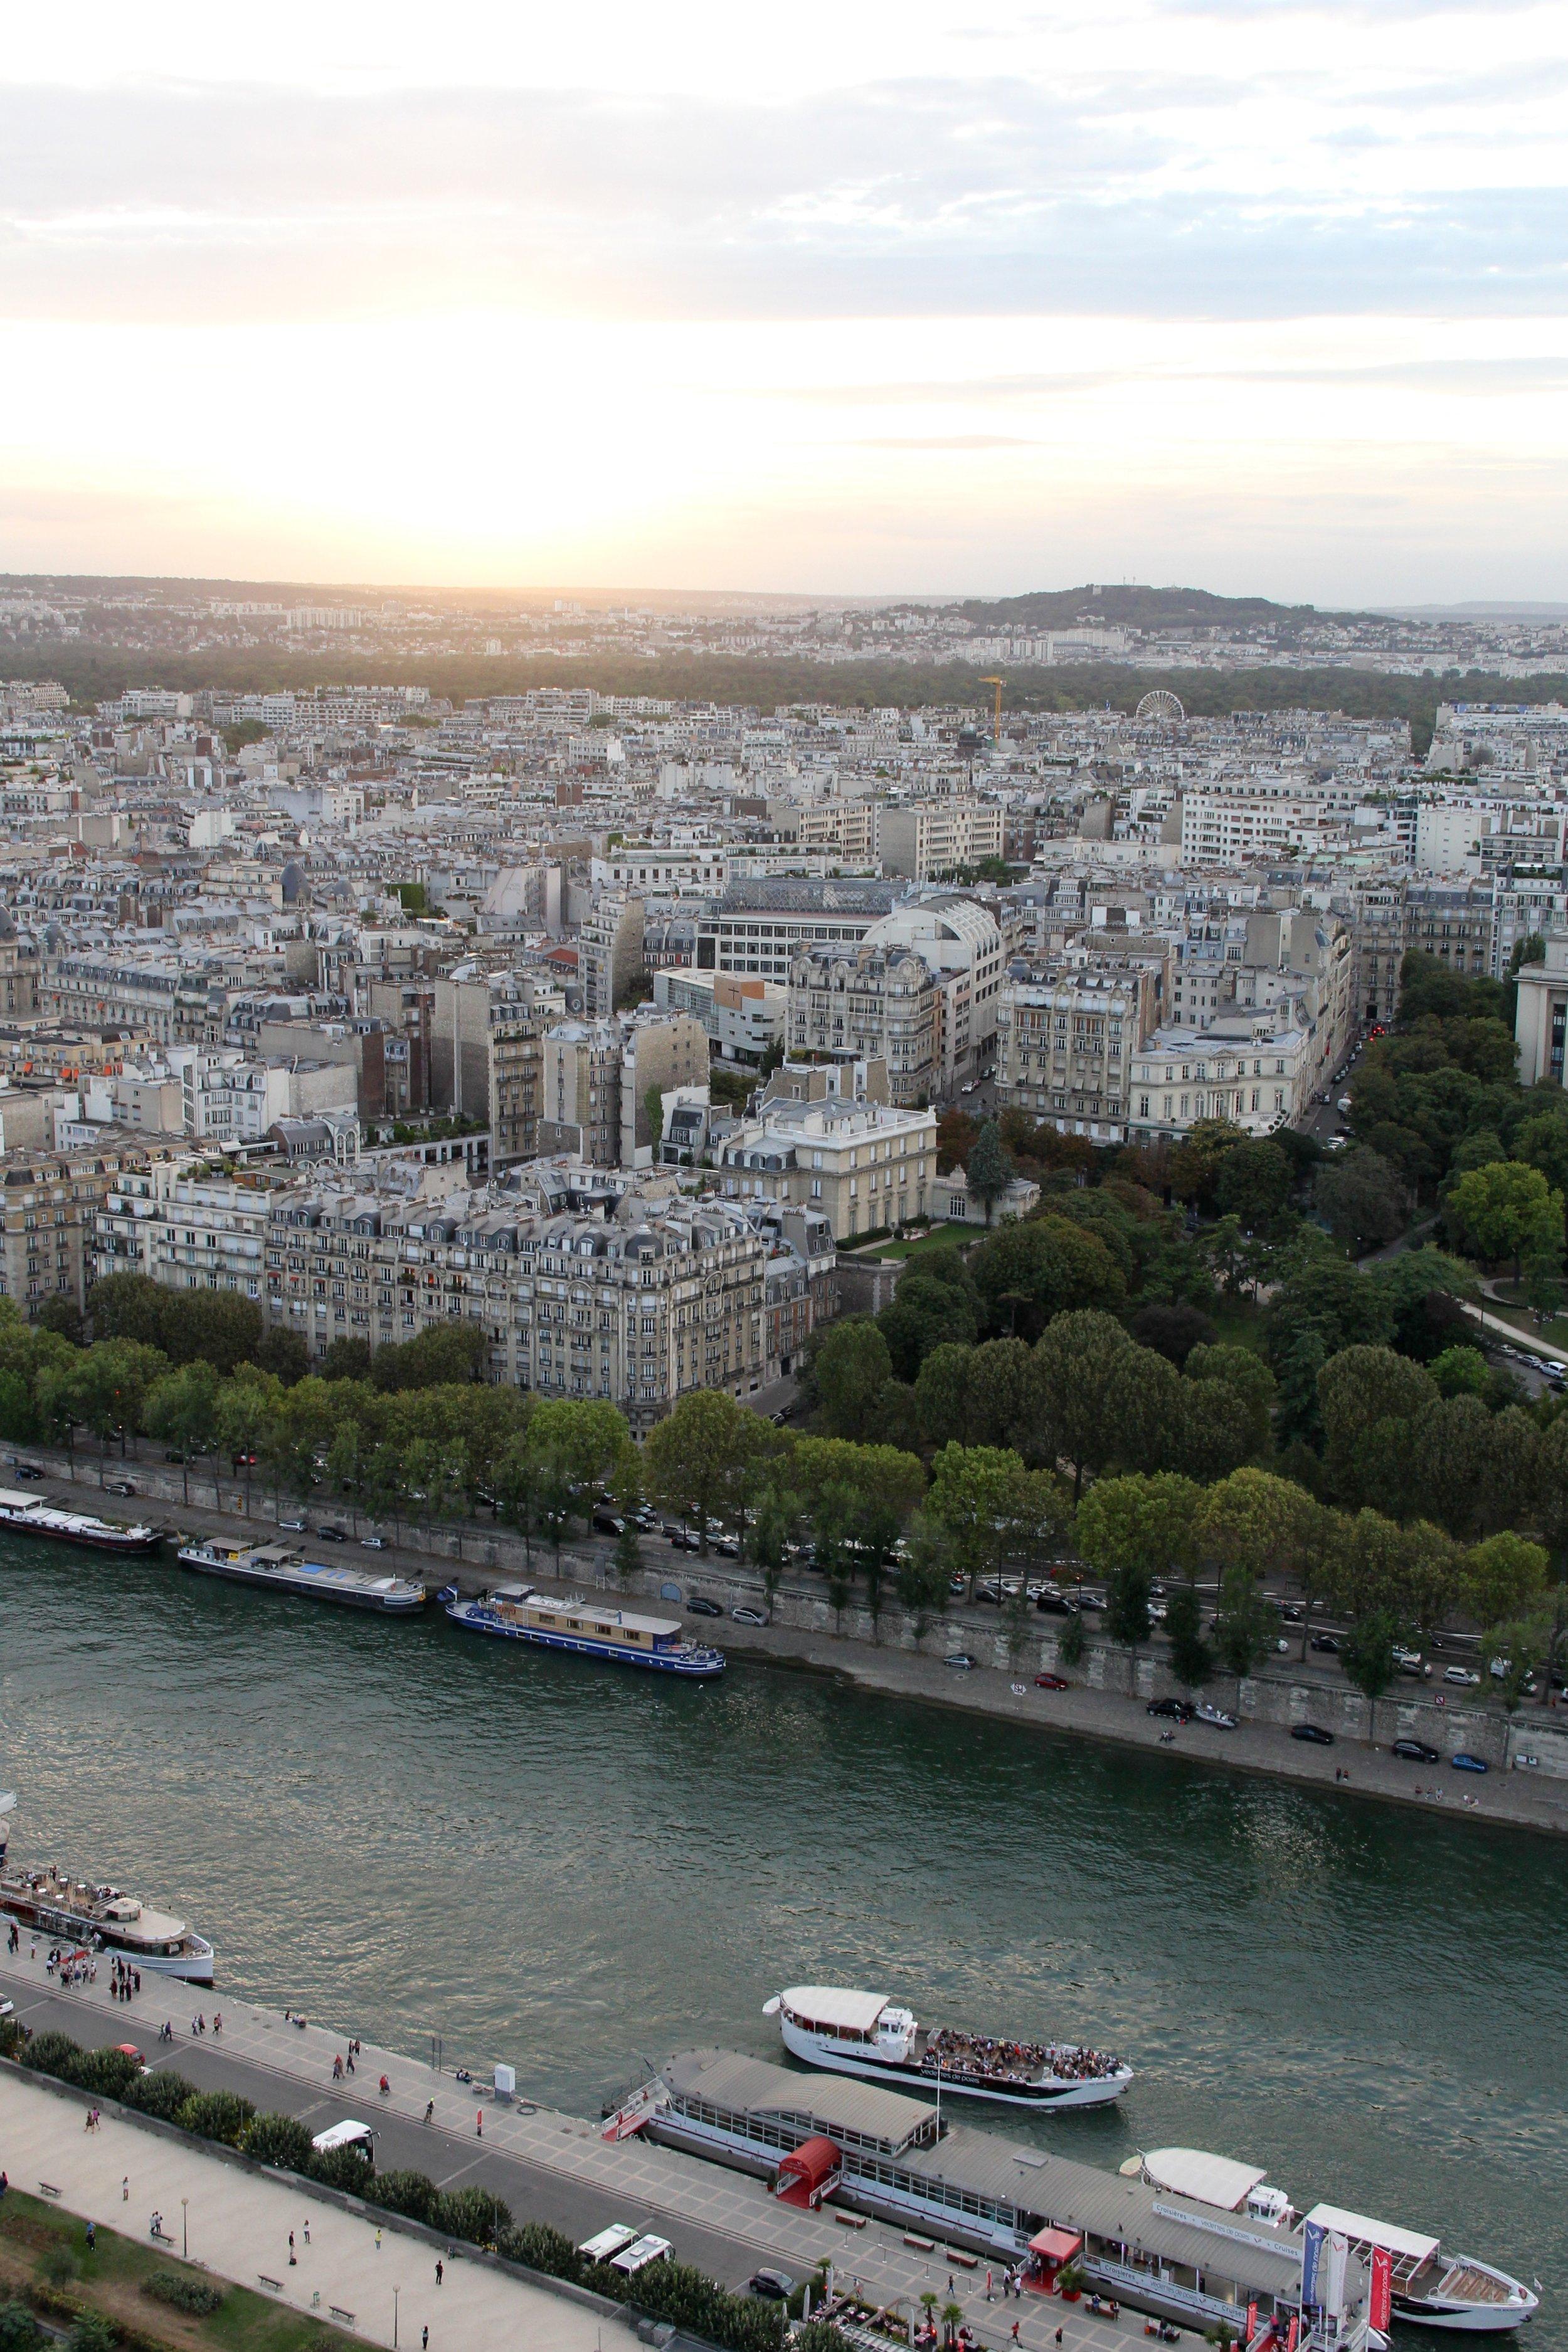 2016.09 Paris Edited 8291.jpg